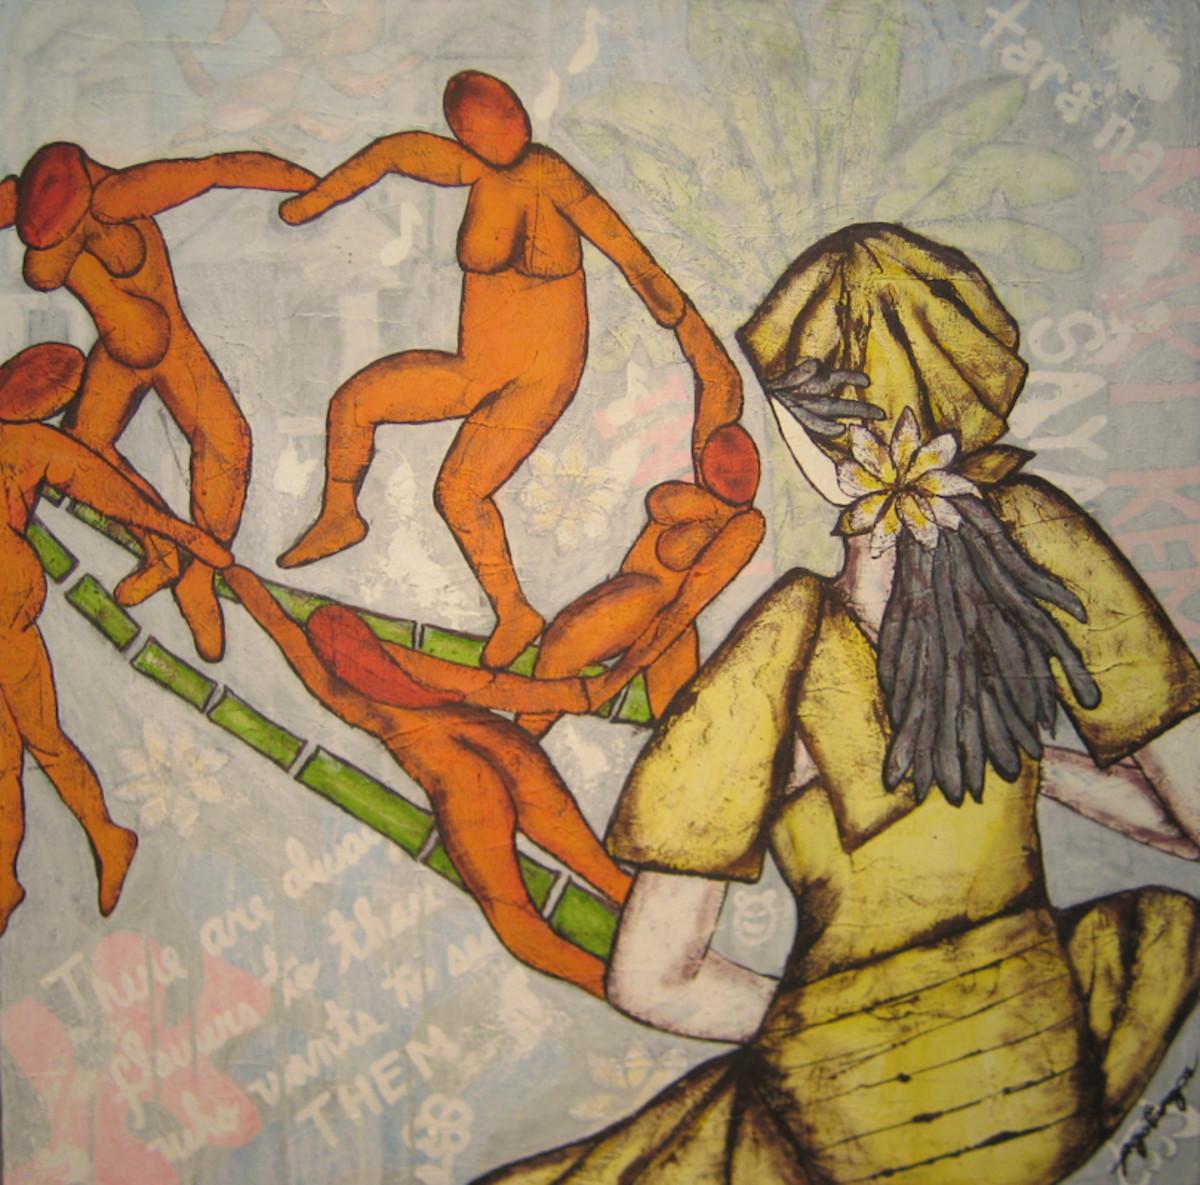 Tinikling with Manong Matisse, 100 x 100 cm